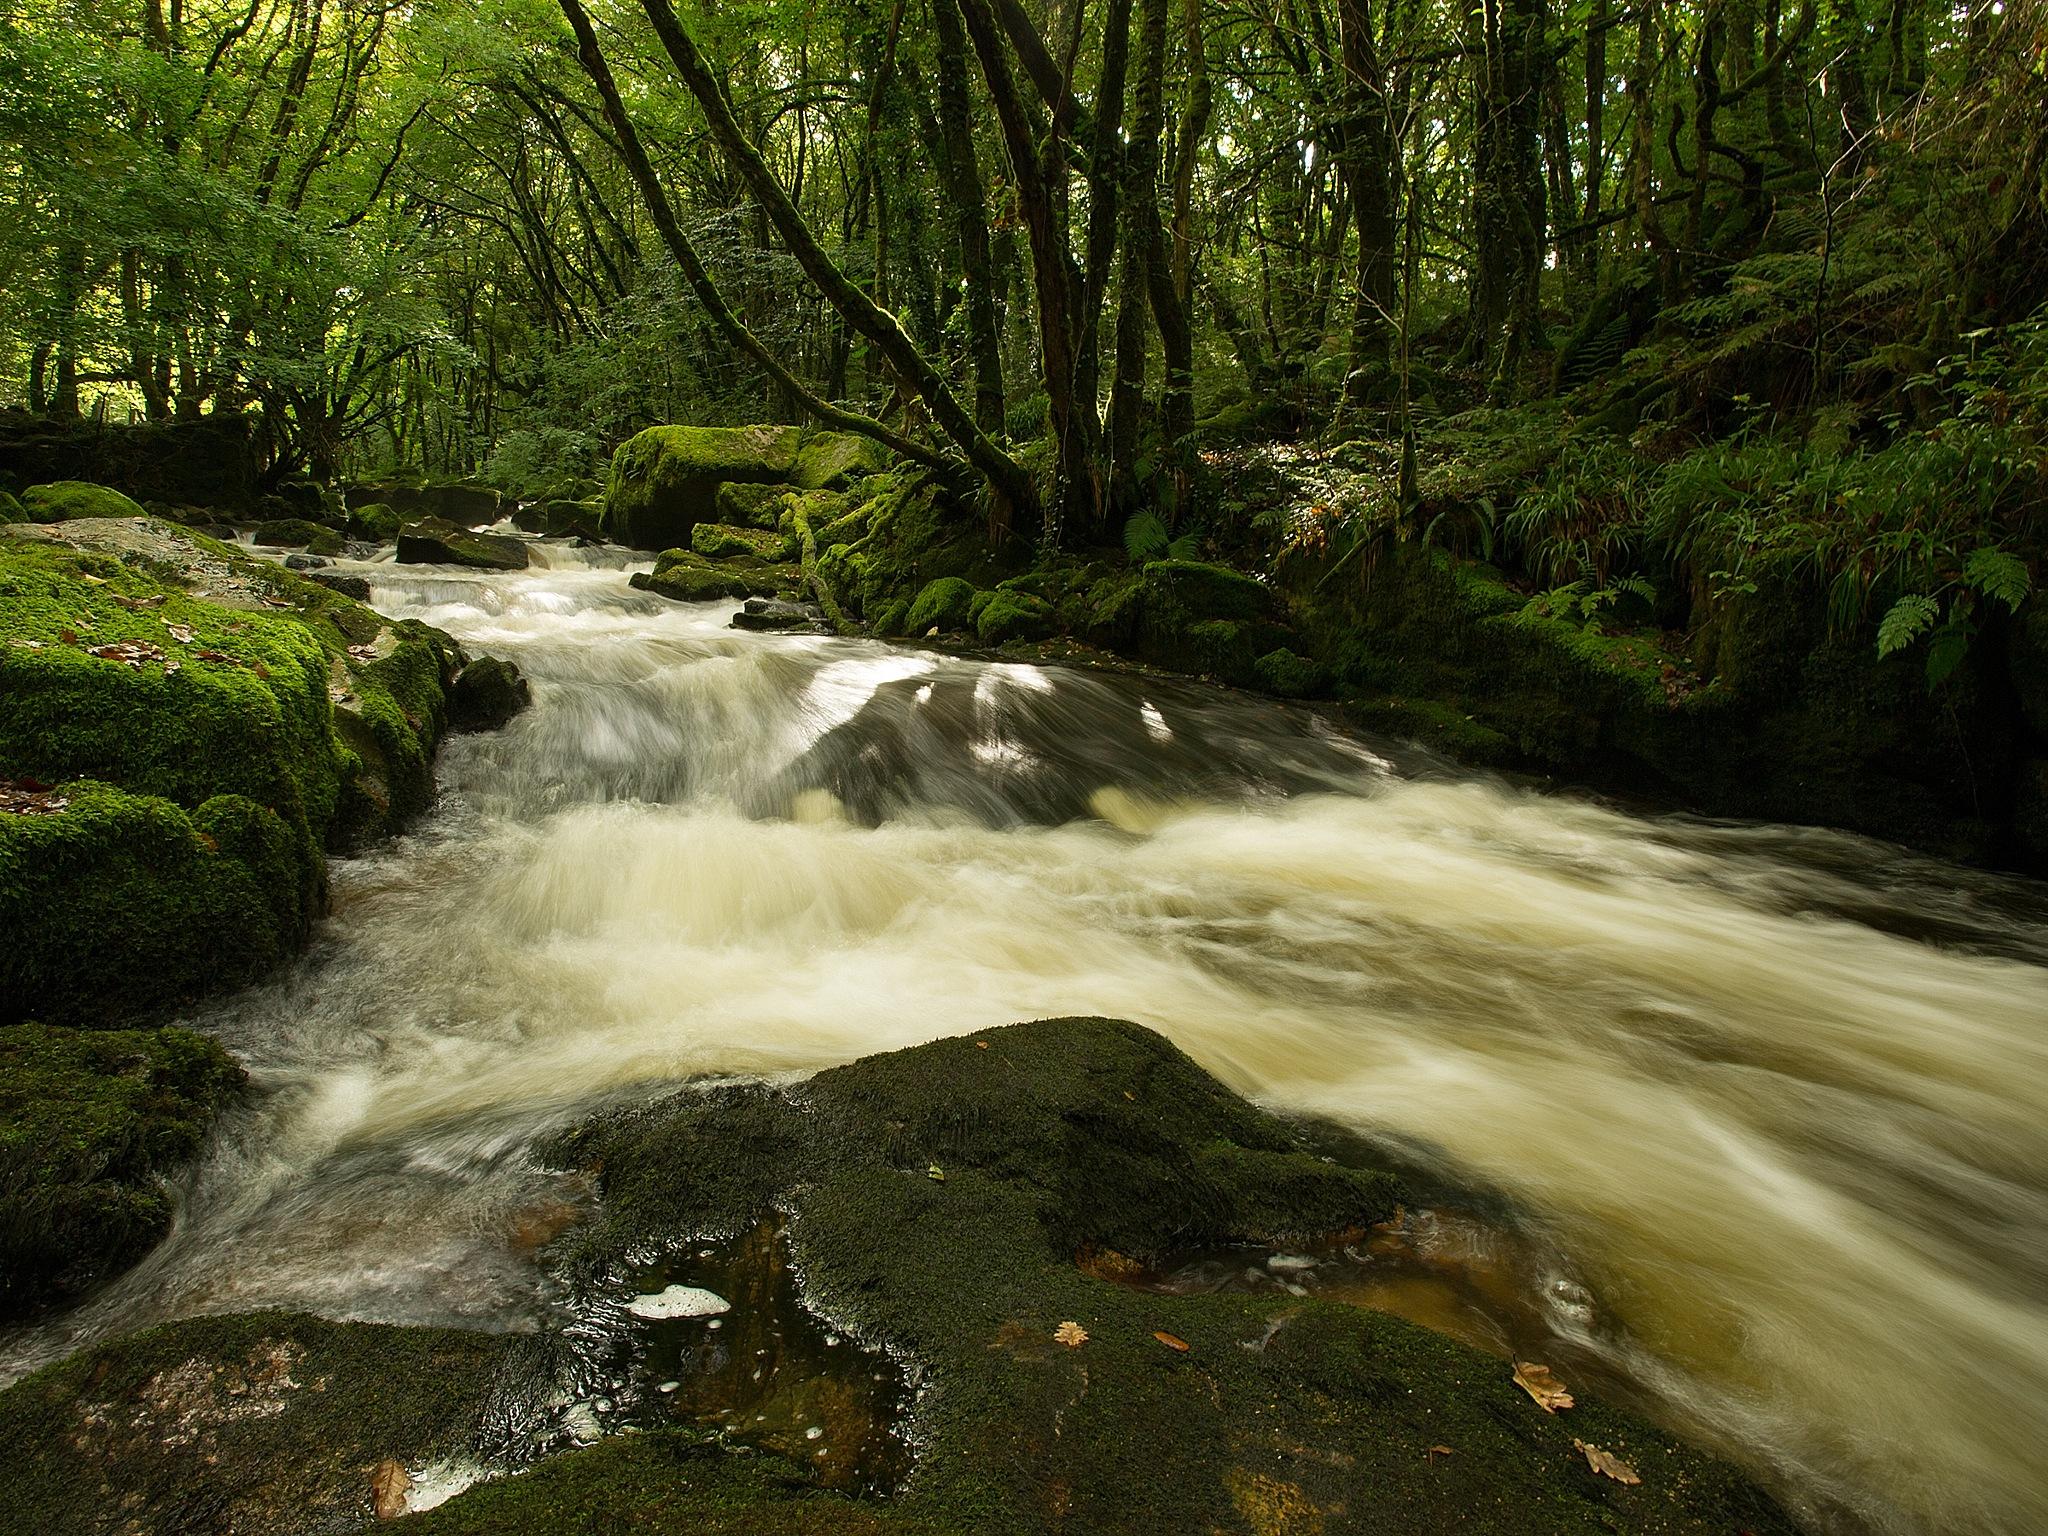 Golitho Falls, Bodmin Moor by Peter Puddiphatt